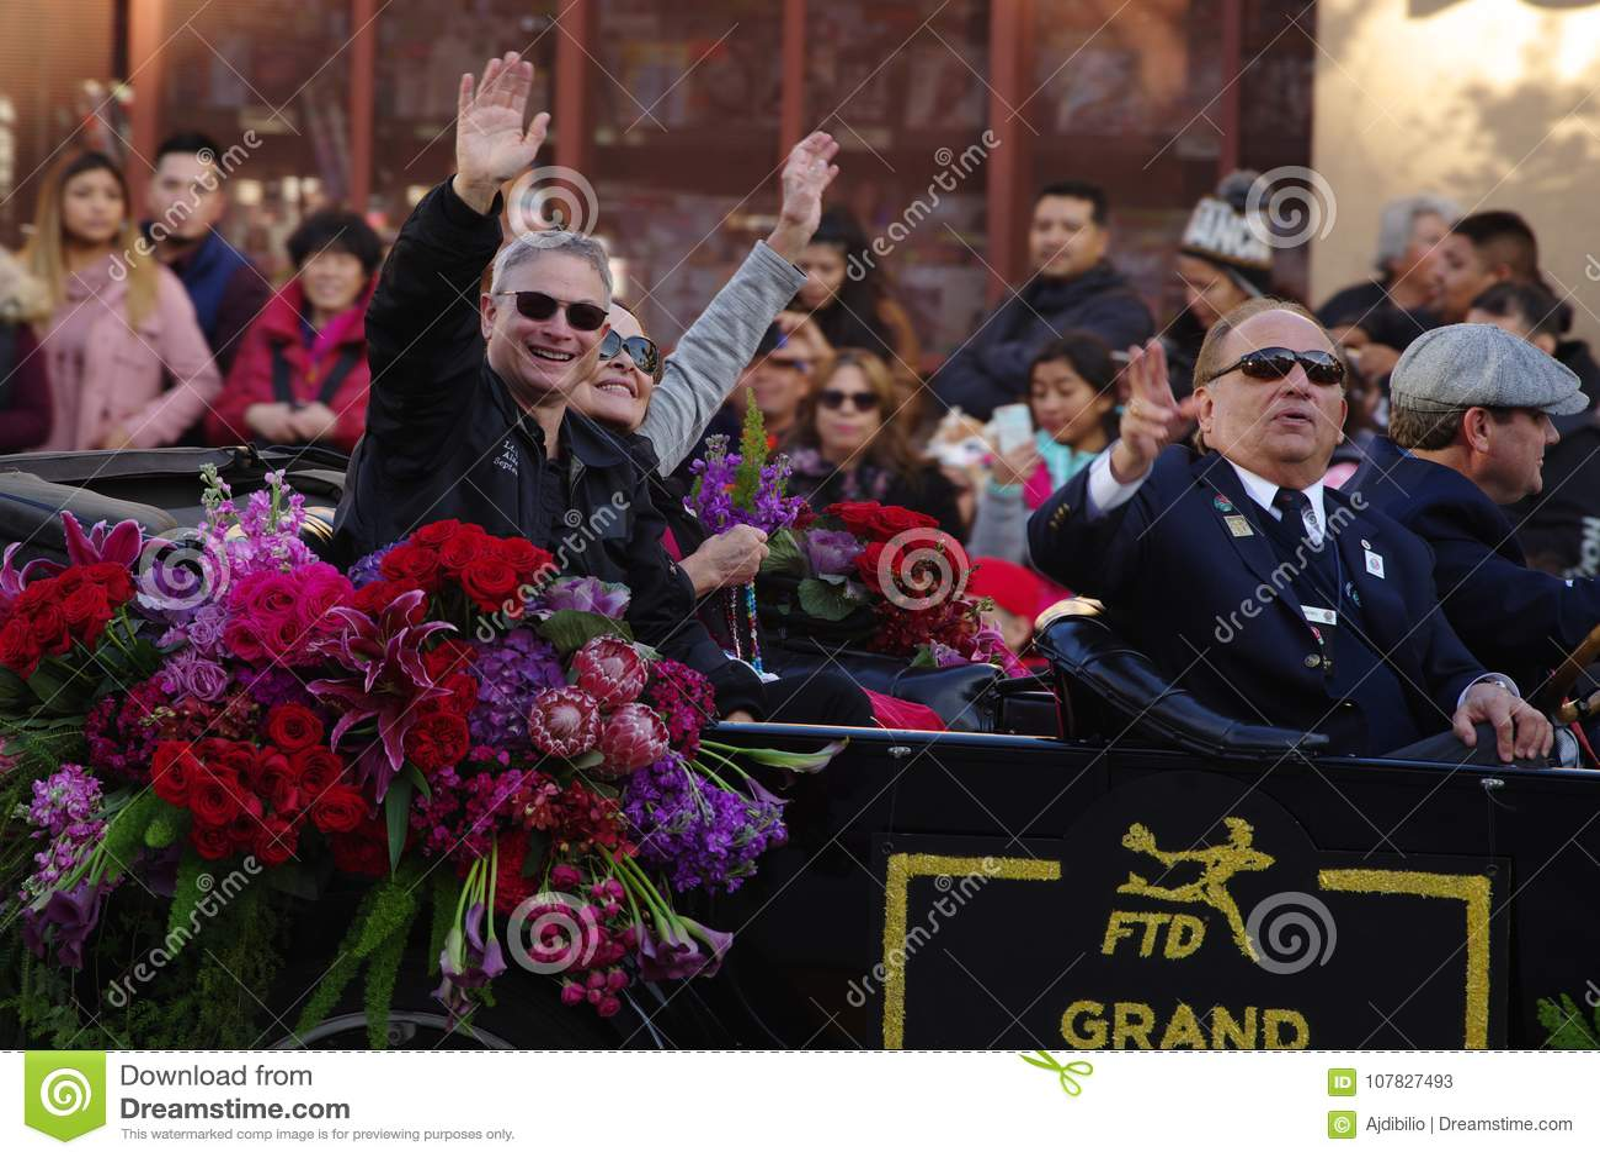 Gary Sinise Grand Marshal